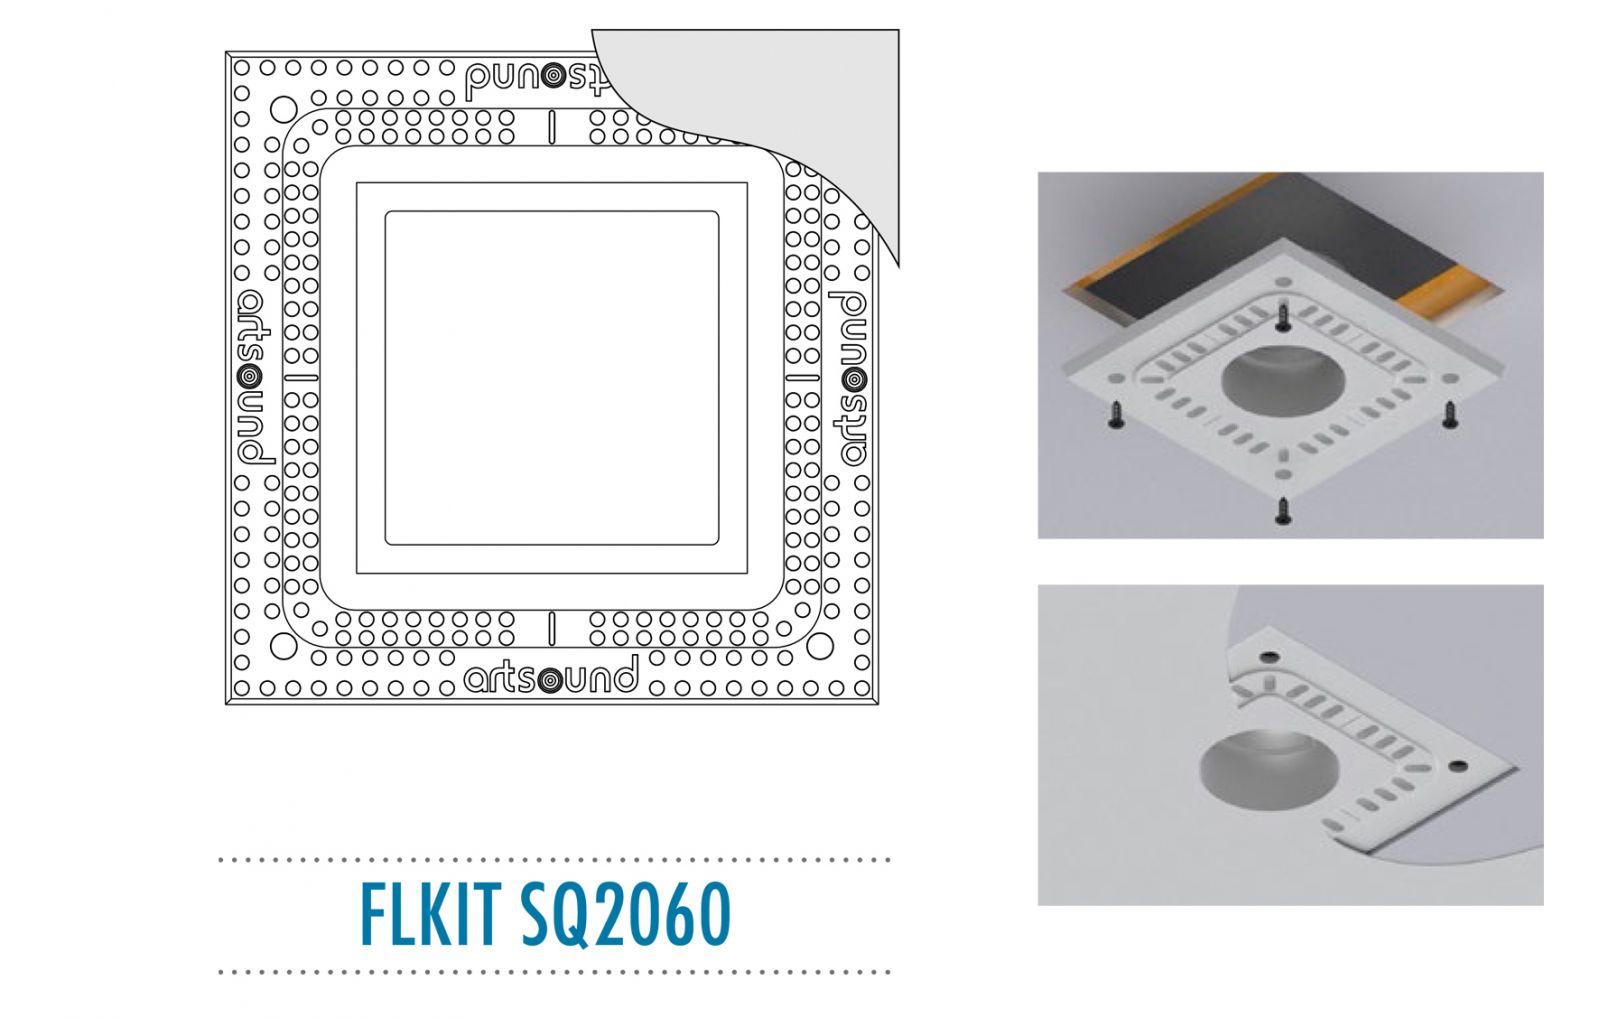 FLKIT SQ2060